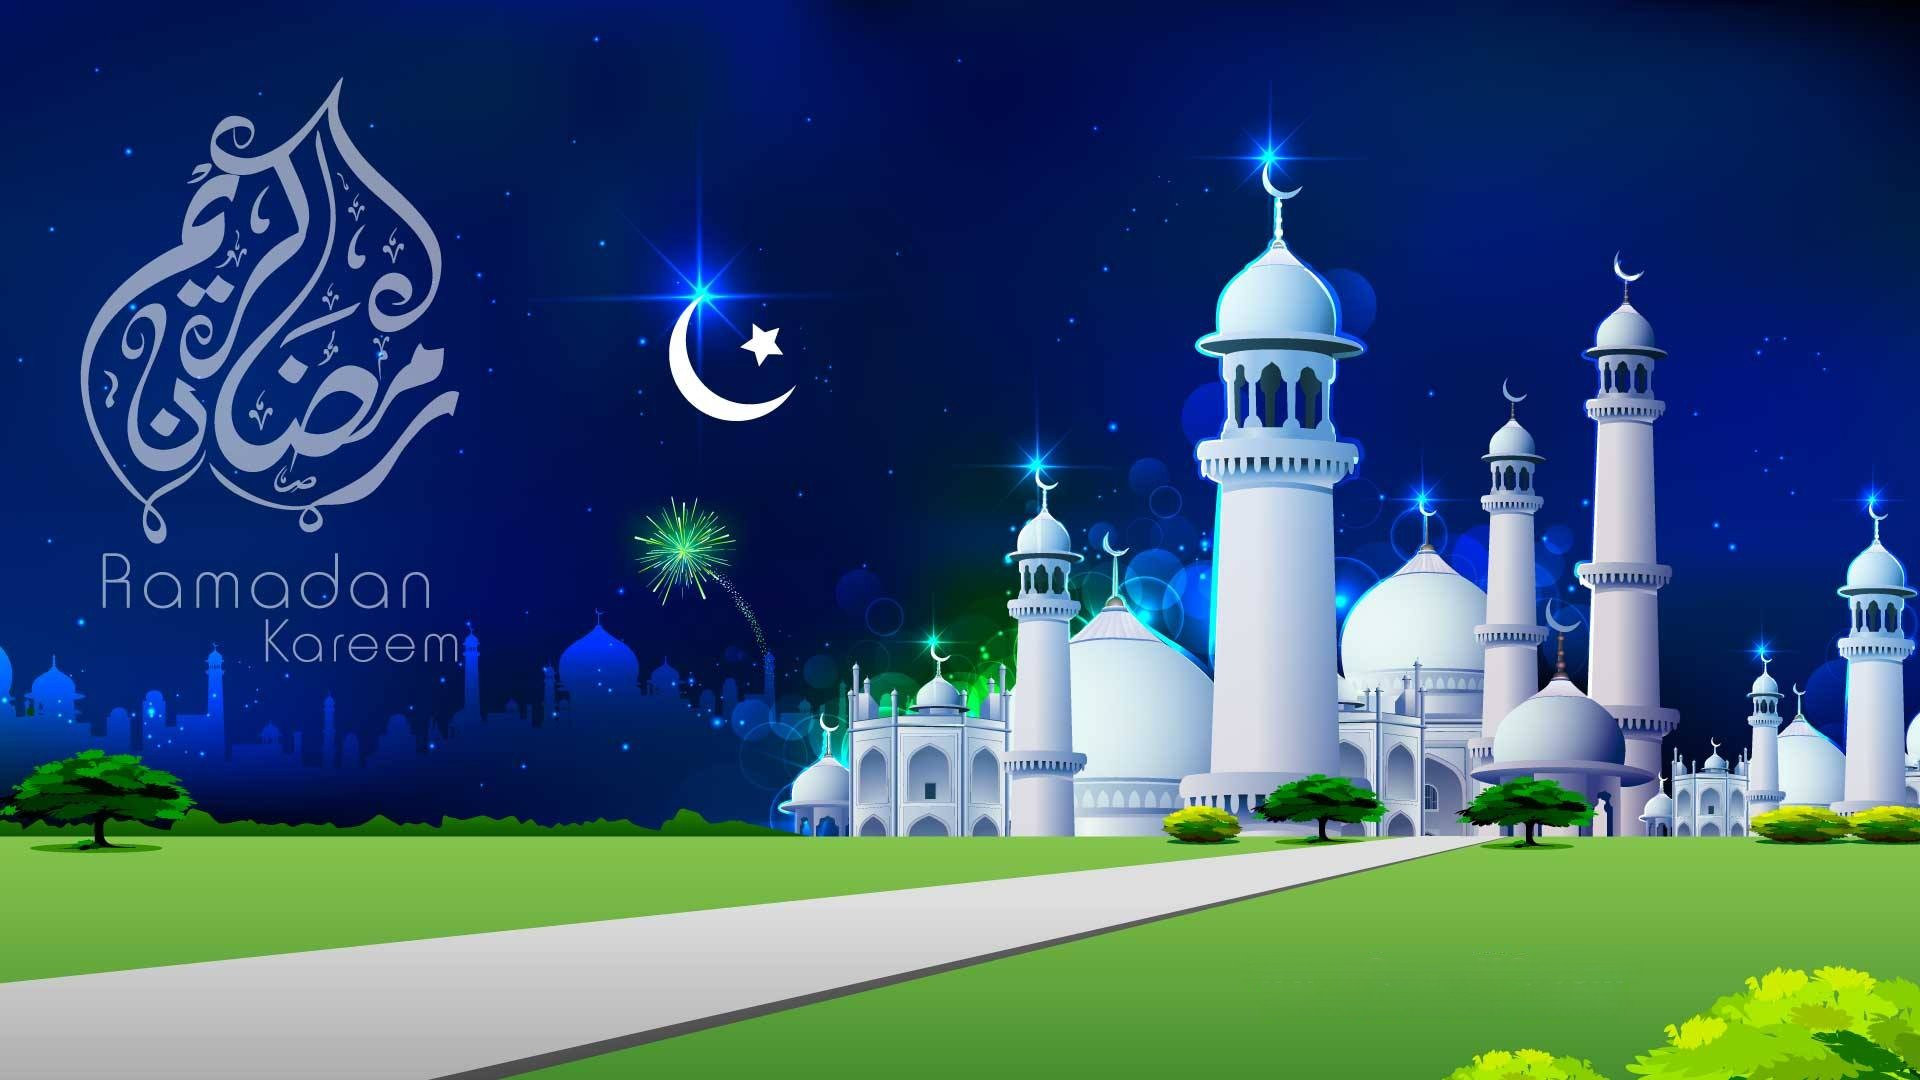 Картинка рамазан 2019